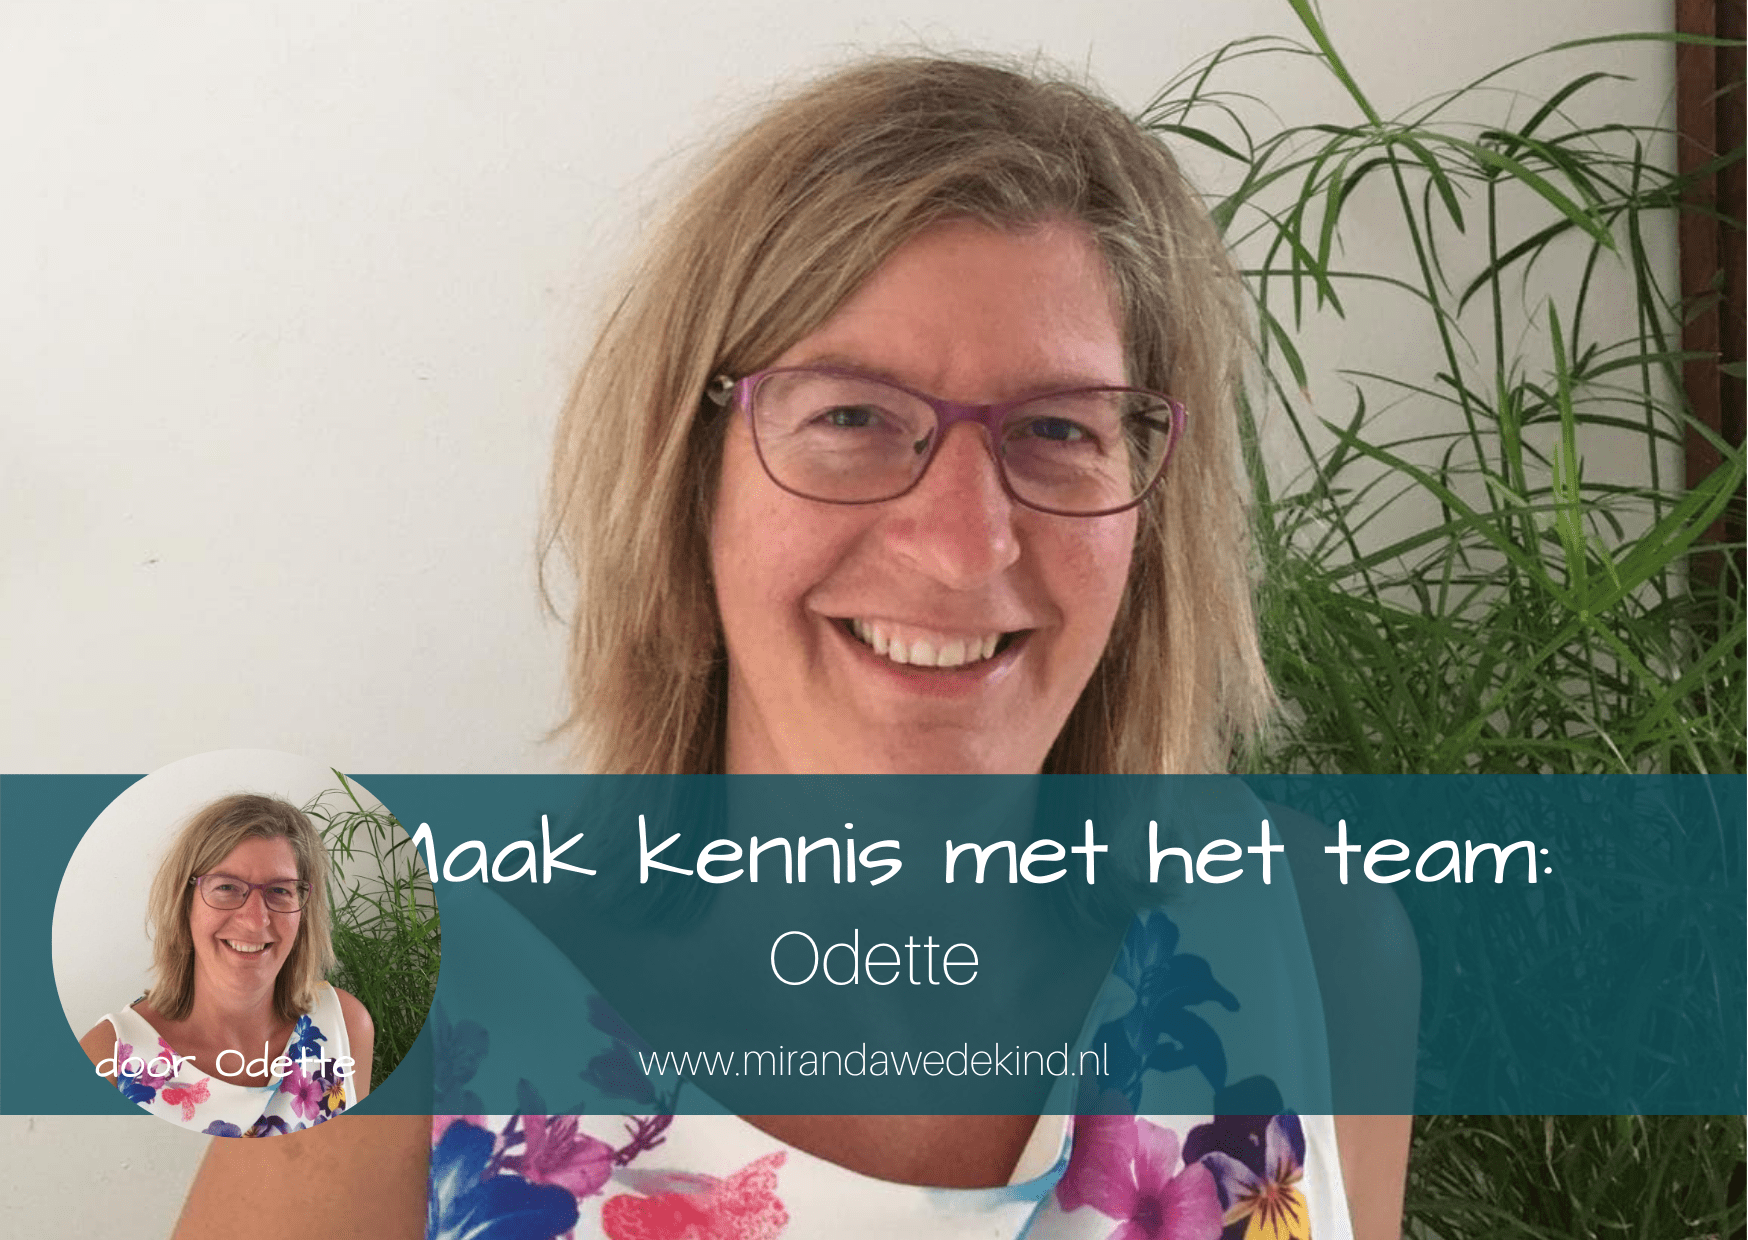 Maak kennis met het team: Odette